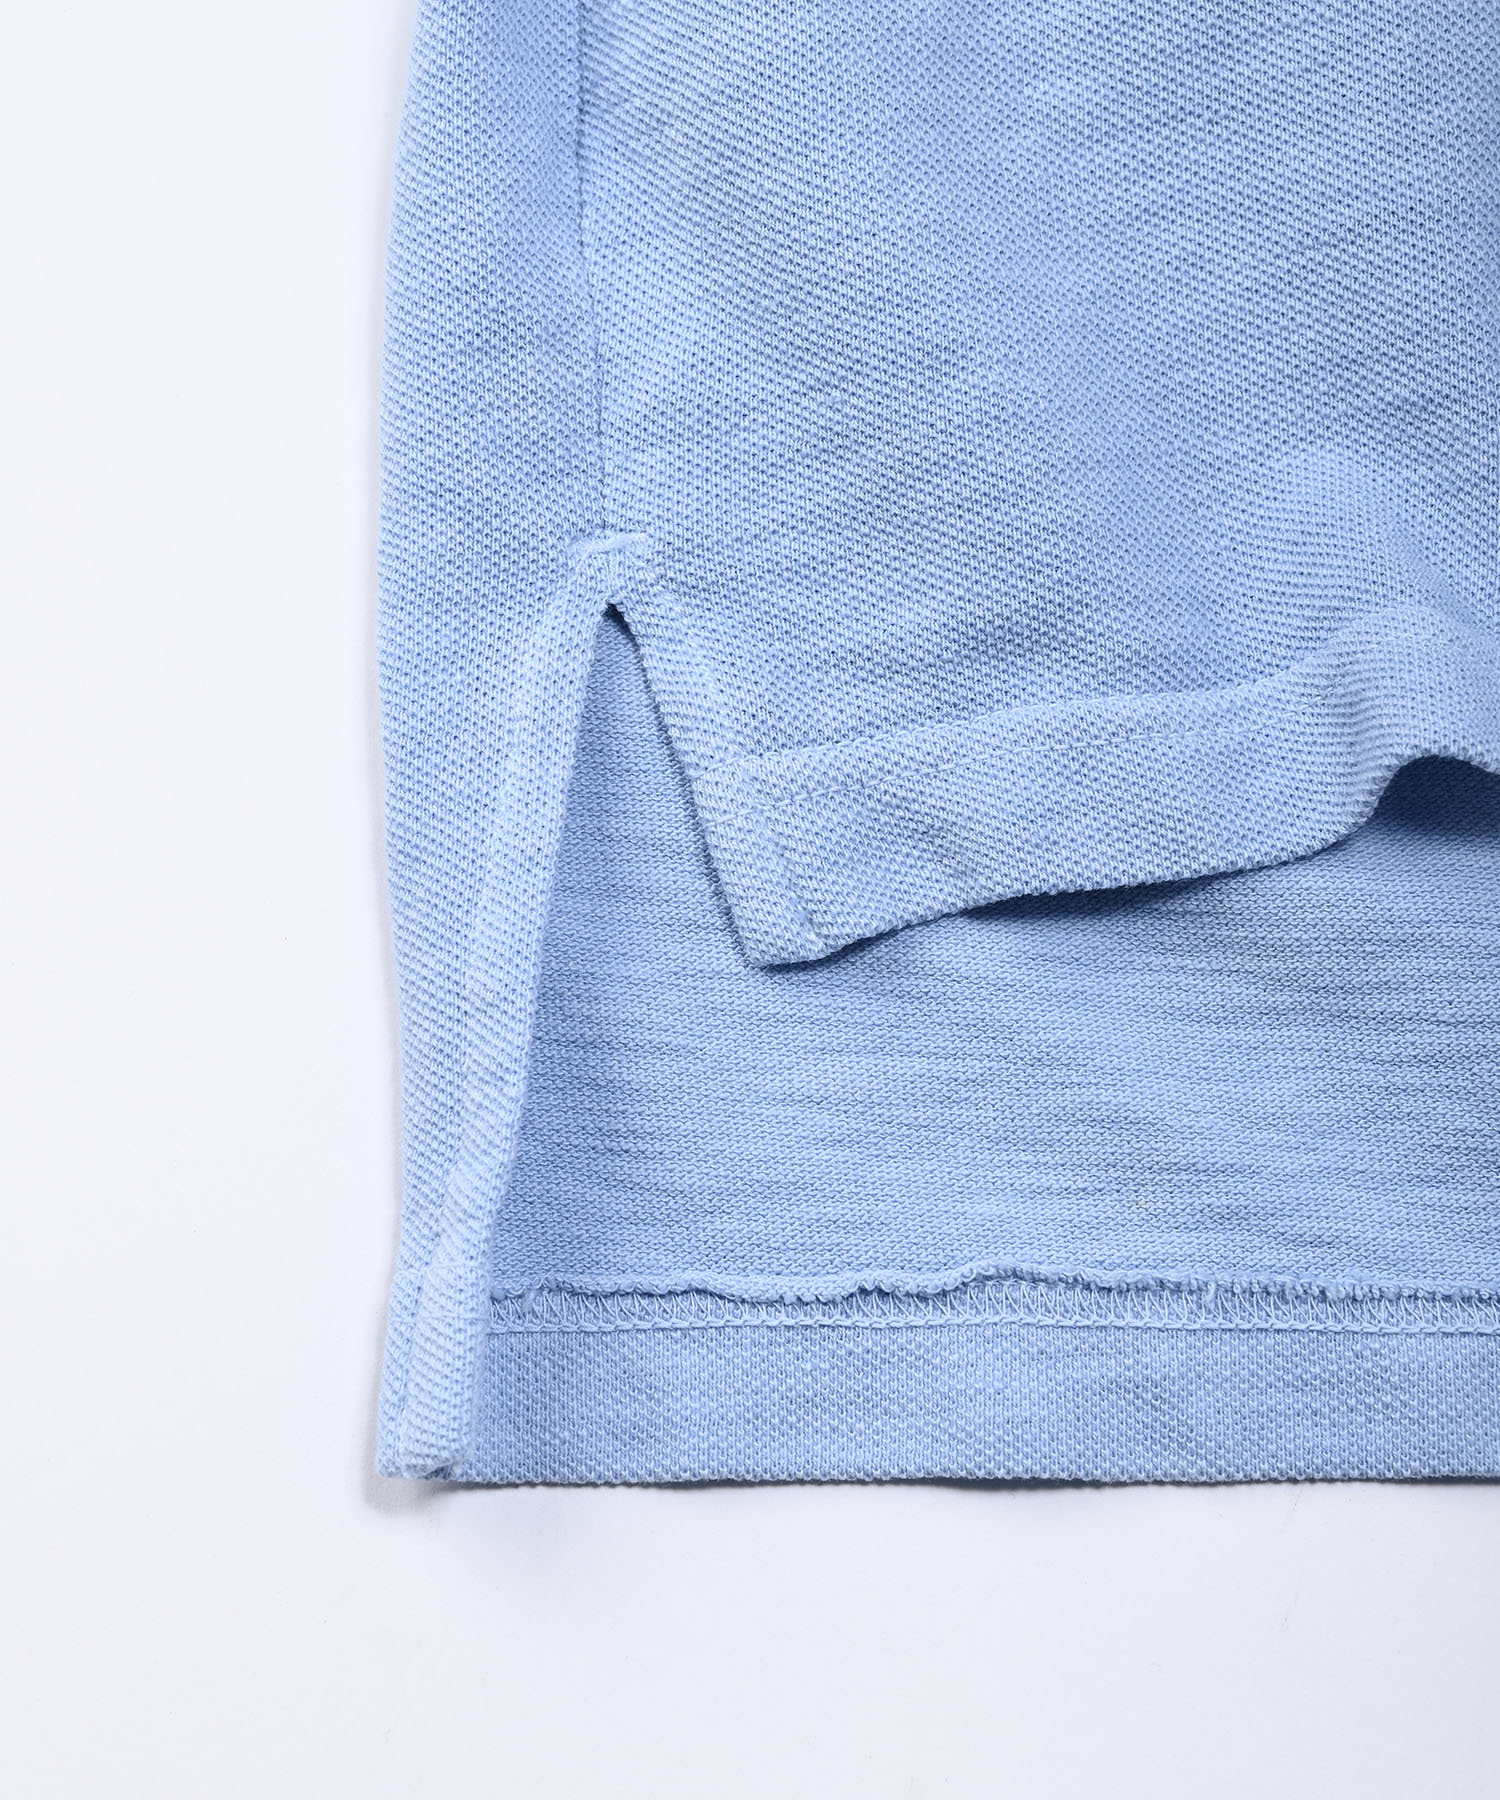 Kanoko Ocean Shiokaze Long-sleeved Polo Shirt (0421)-10